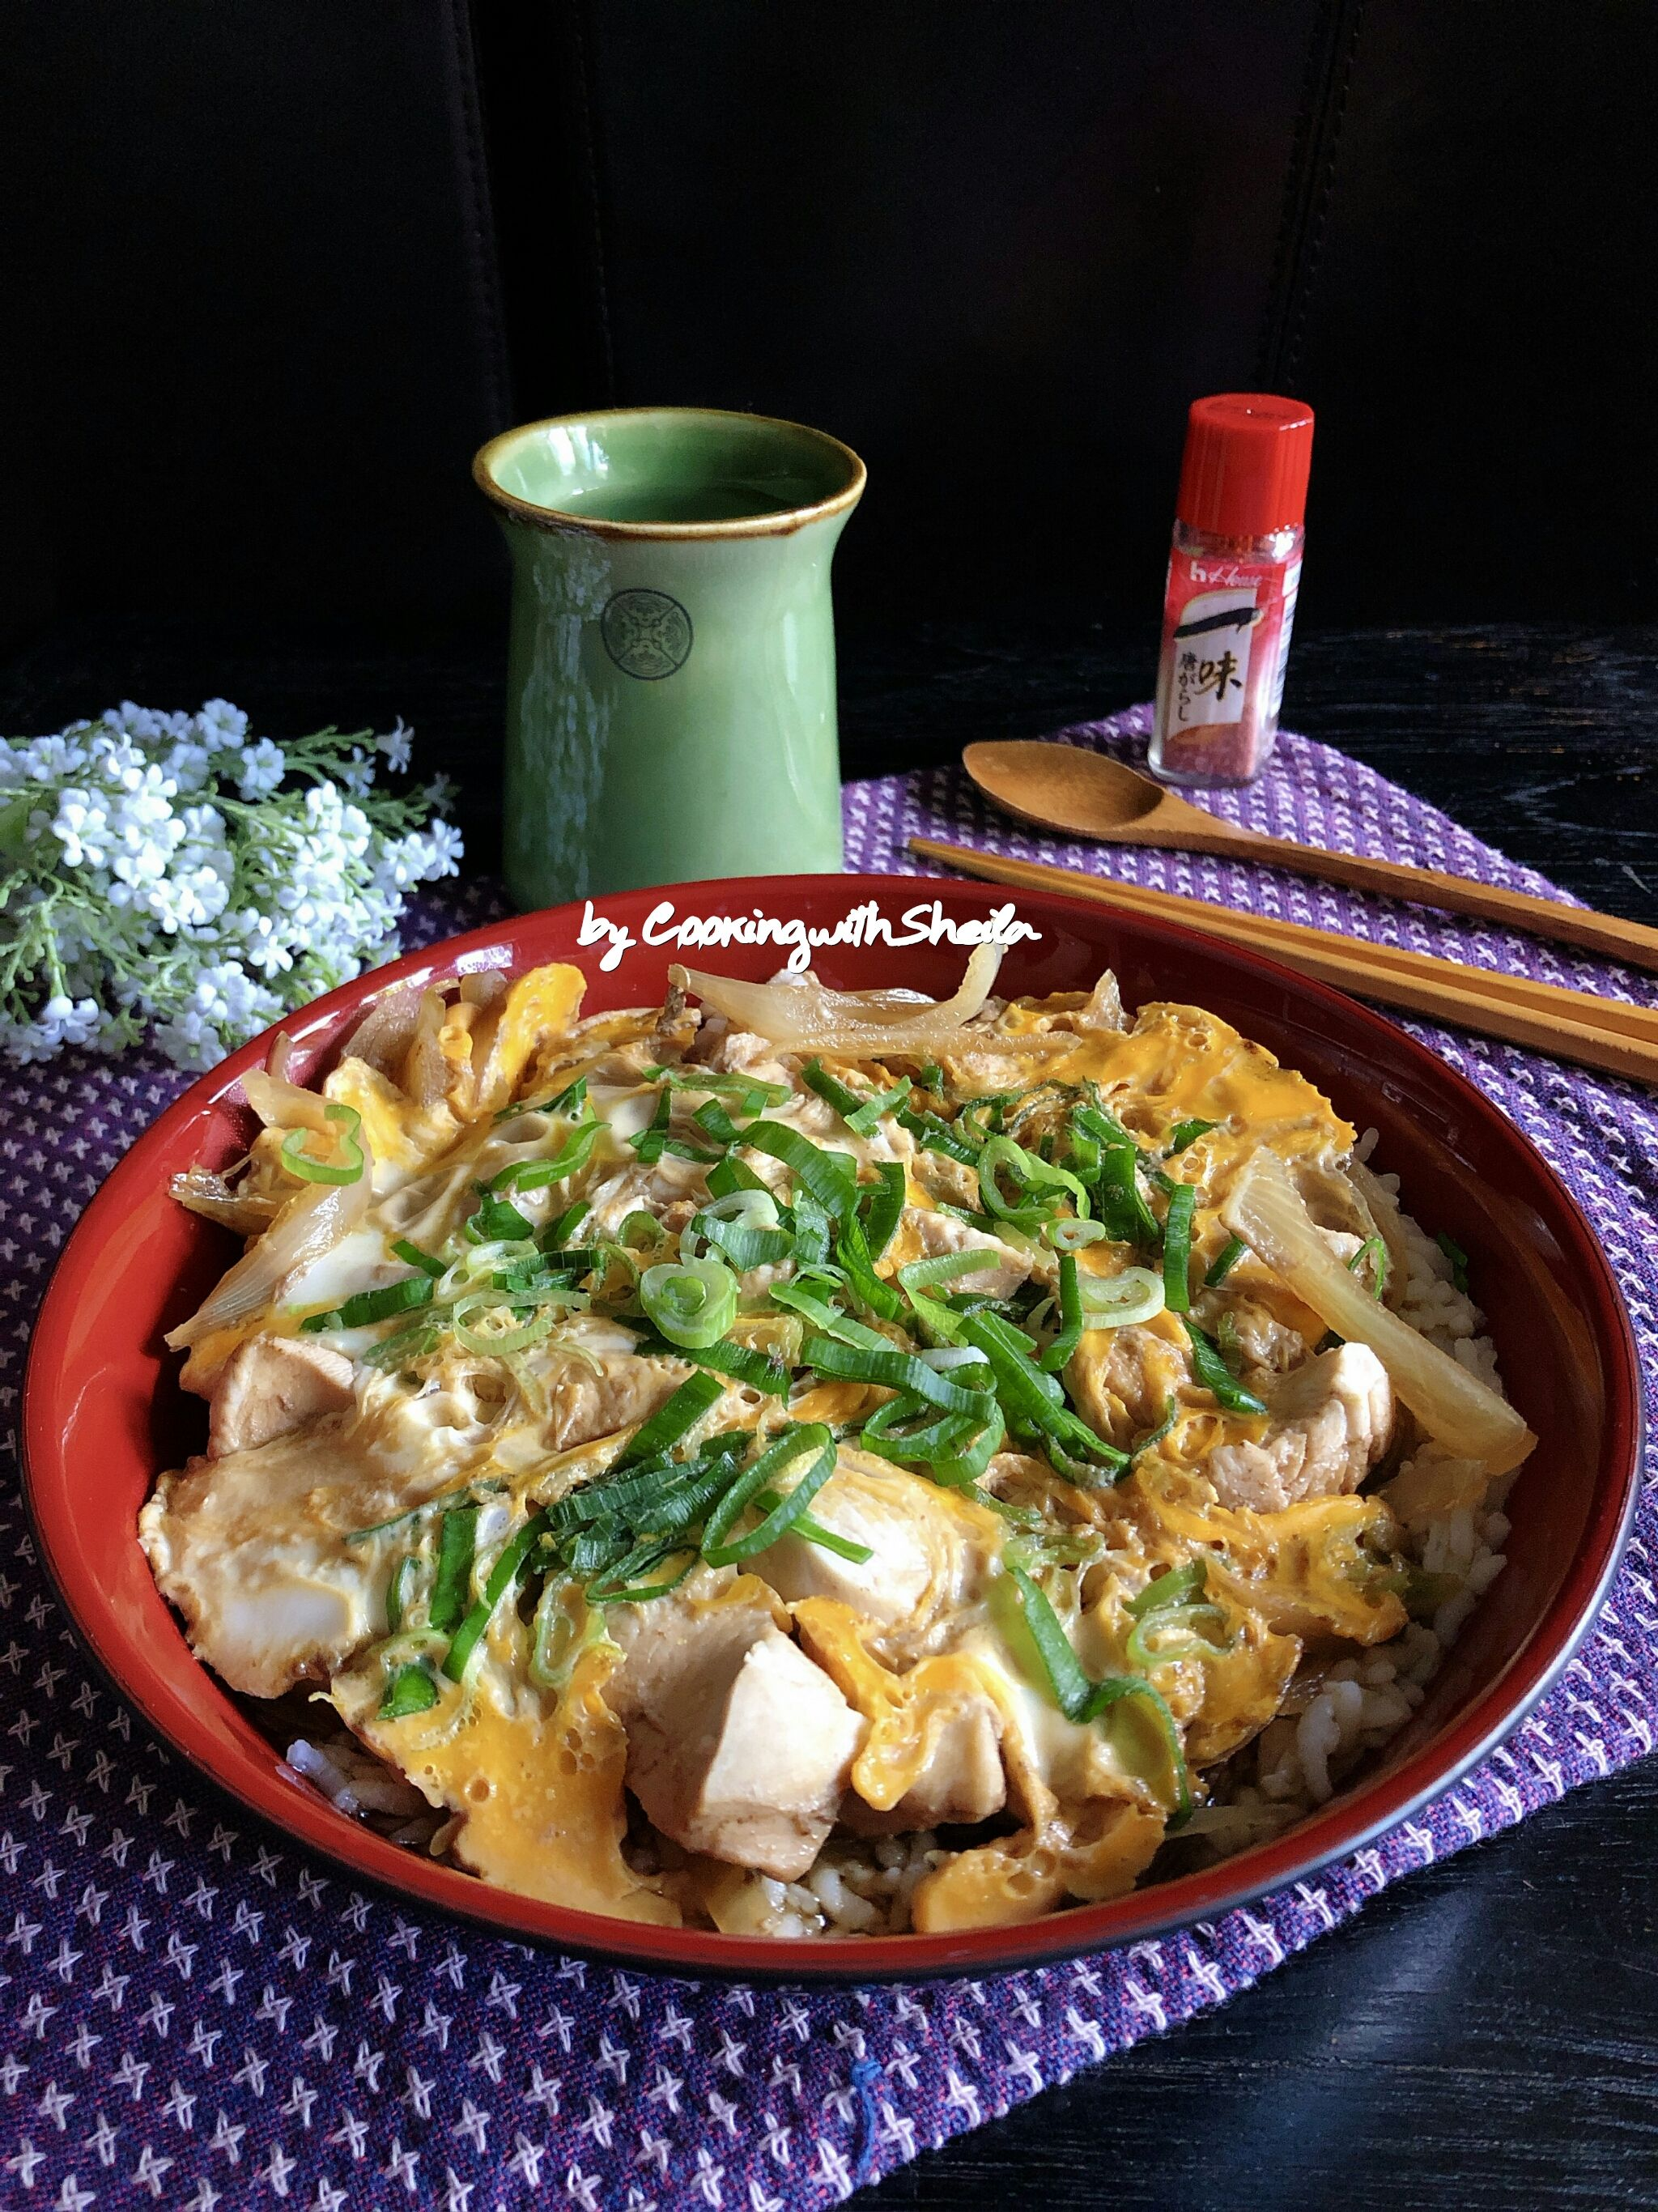 Oyakodon Cooking With Sheila Memasak Resep Masakan Indonesia Resep Makanan